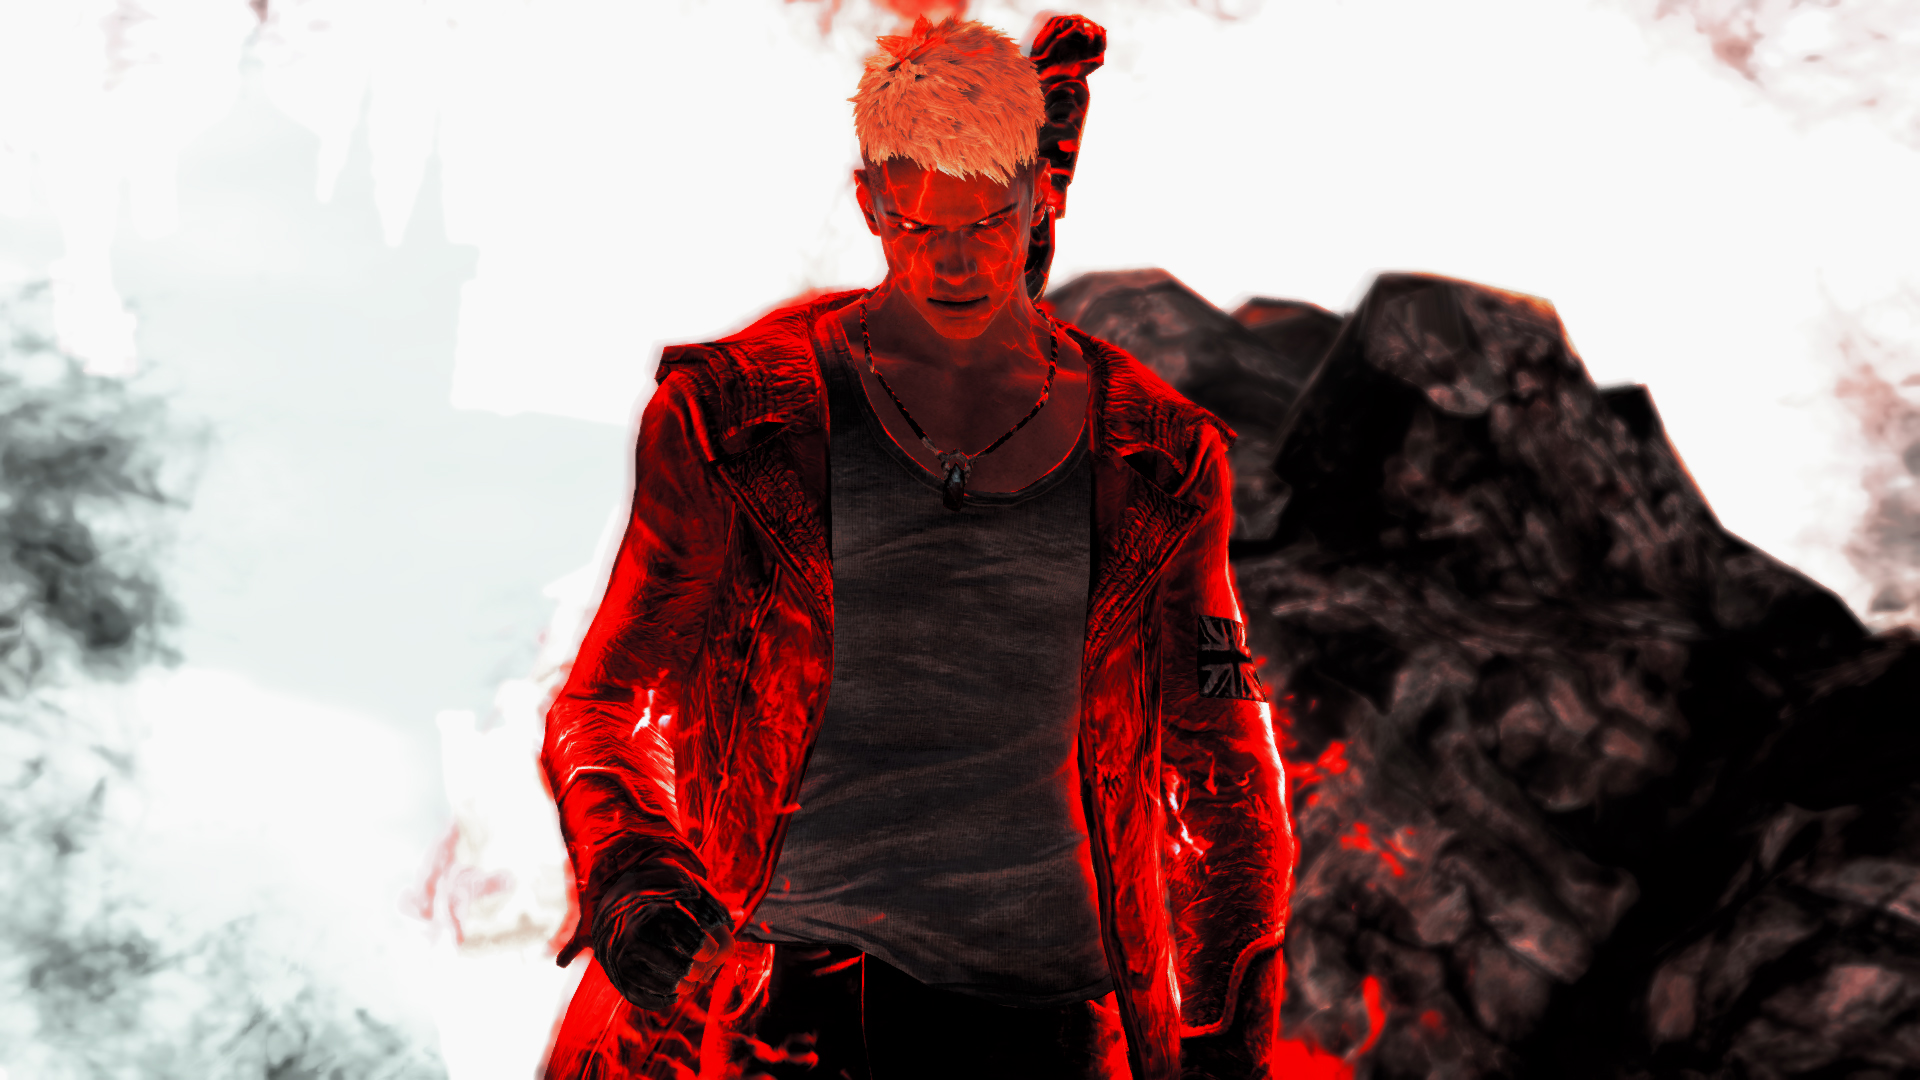 Image dante devil trigger dmcg devil may cry wiki dante devil trigger dmcg voltagebd Image collections